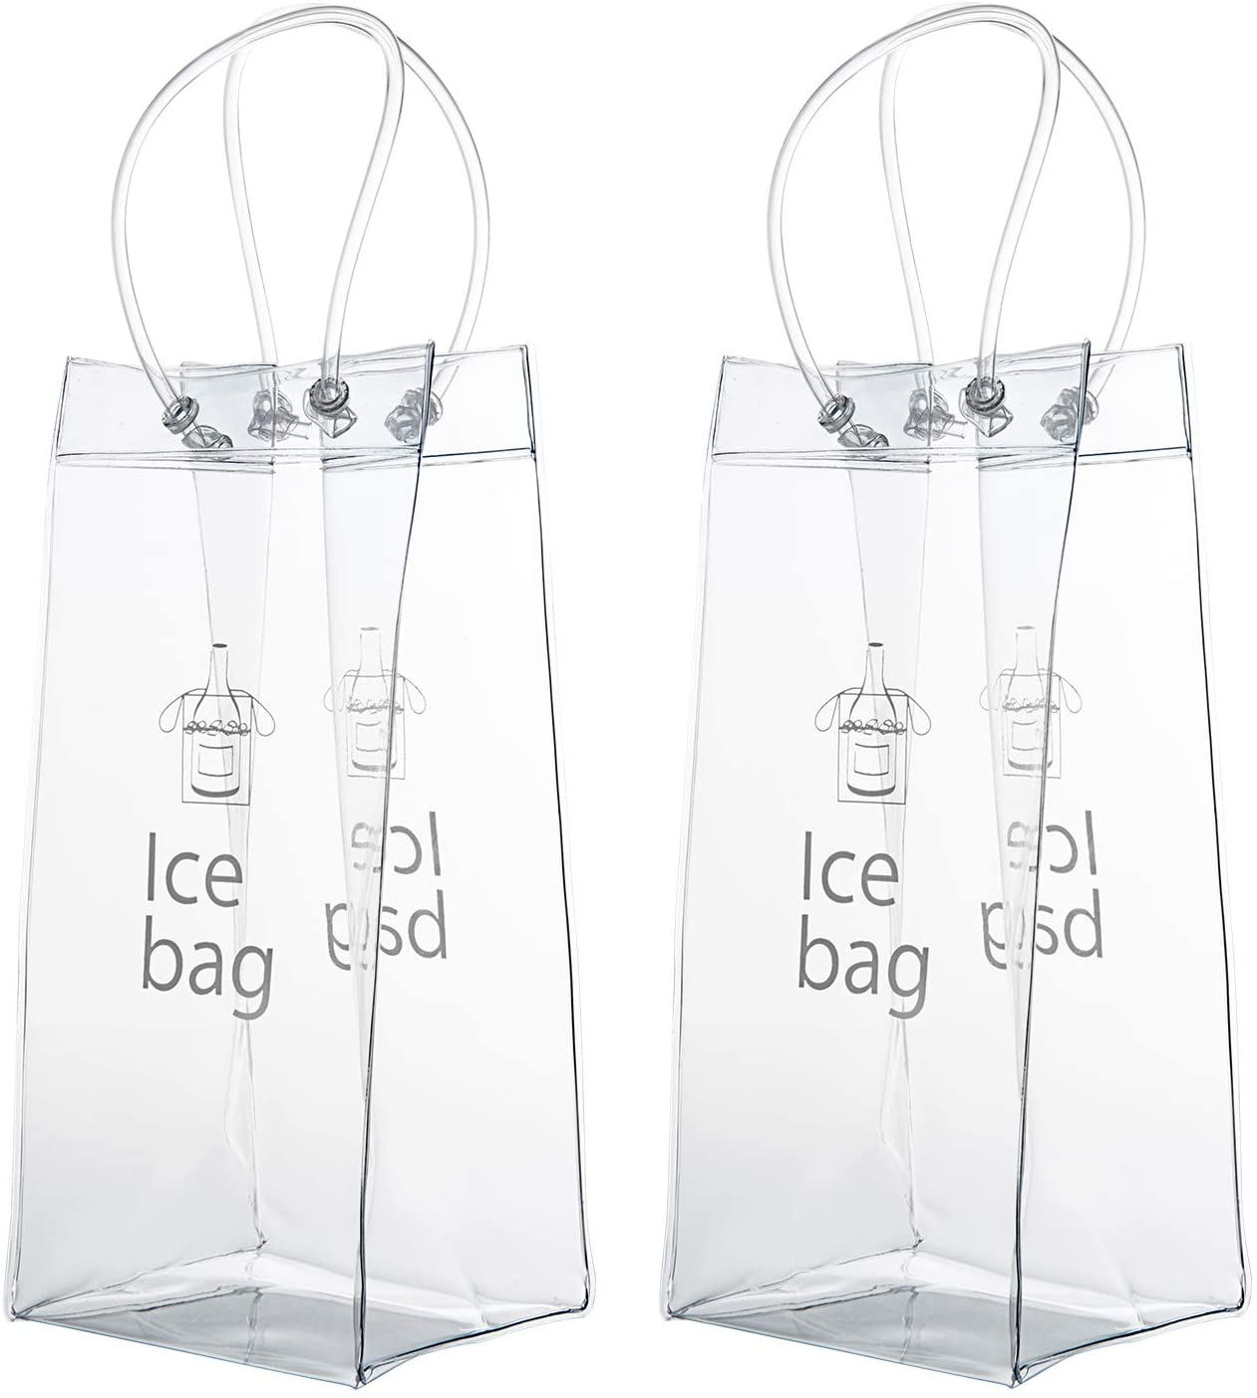 Wolintek Bolso de Hielo,2 Paquetes PVC Champagne Bolsa de Hielo Bolsa de Refrigerador con Mango para Pubs y Restaurantes, Hogar